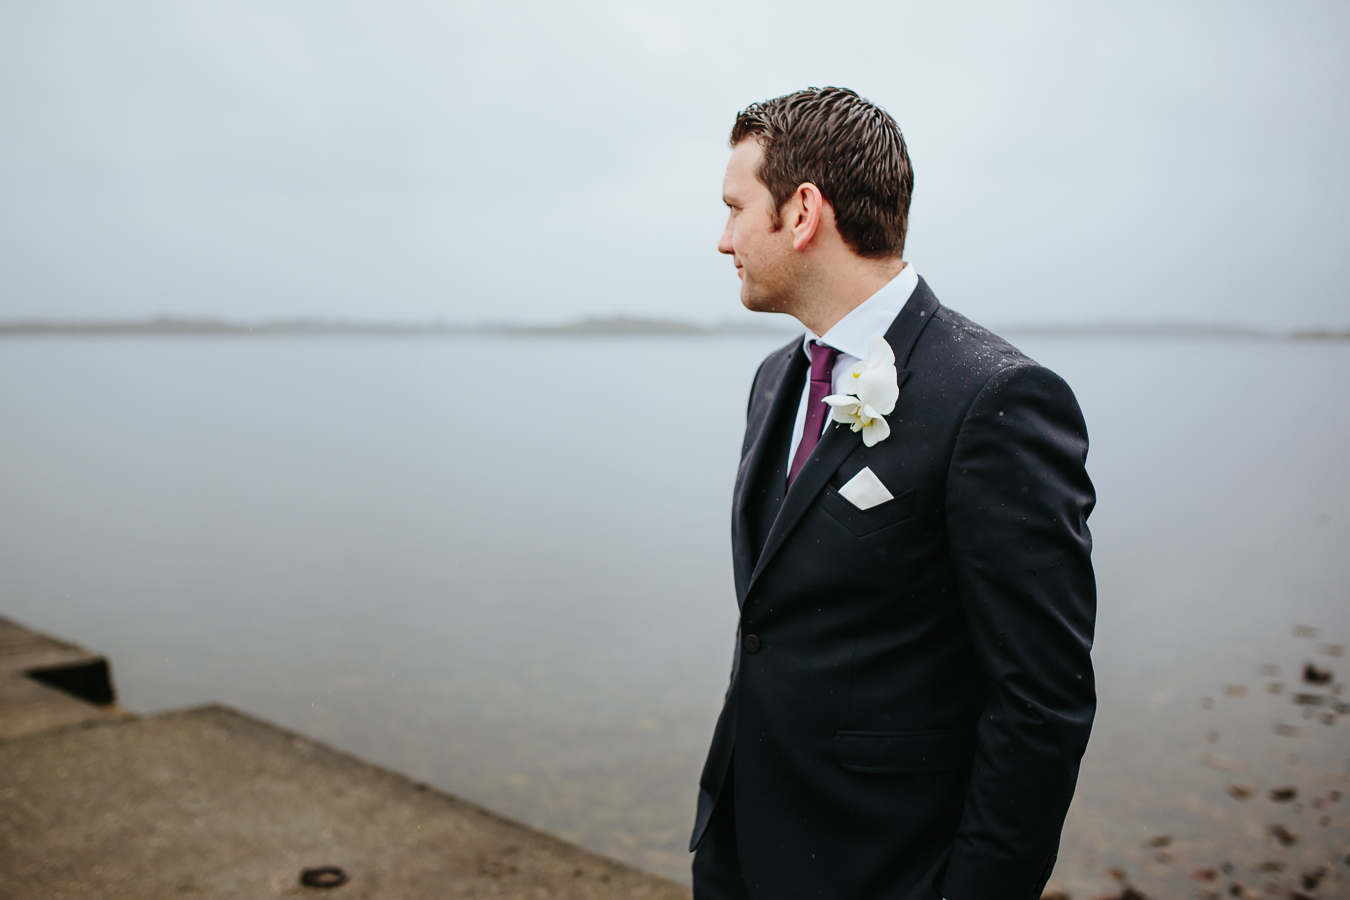 Aghadoe heights hotel wedding by Killarney wedding photographers